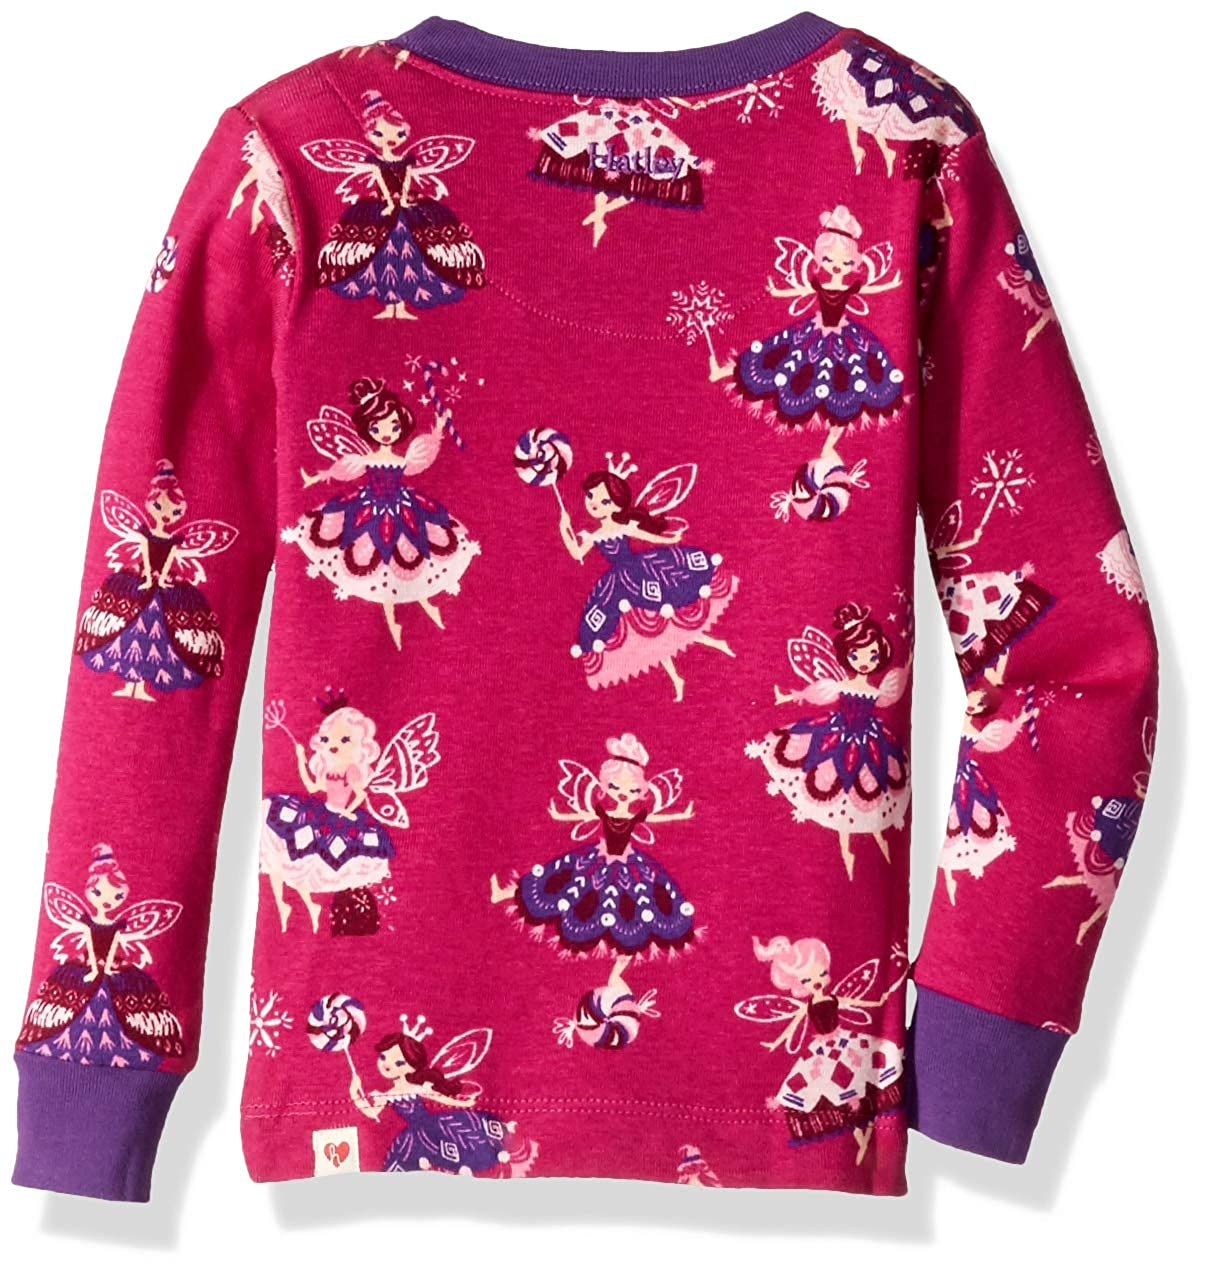 Hatley Girls Pyjama Sets